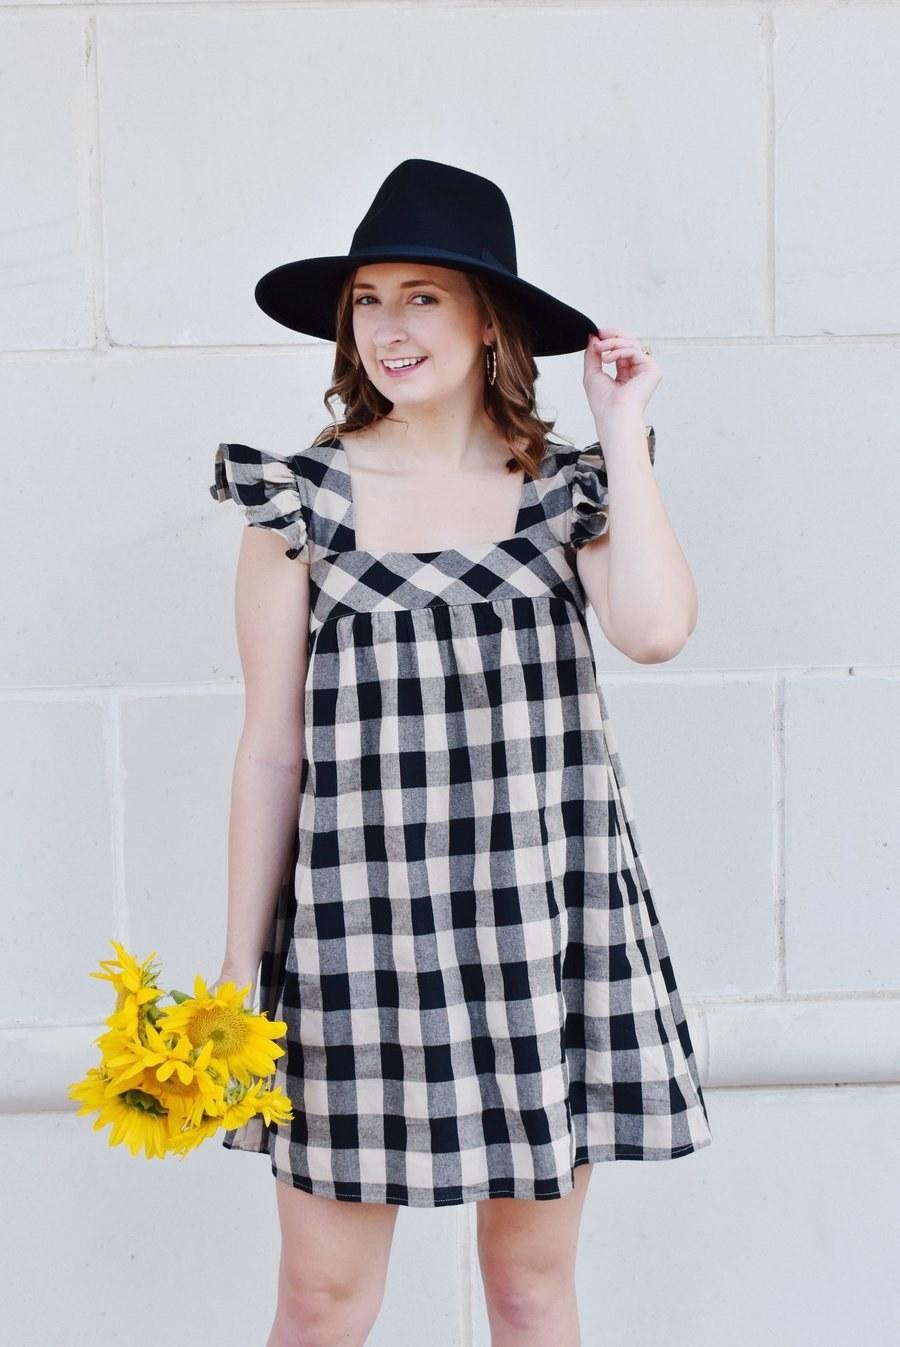 model wearing the gingham dress